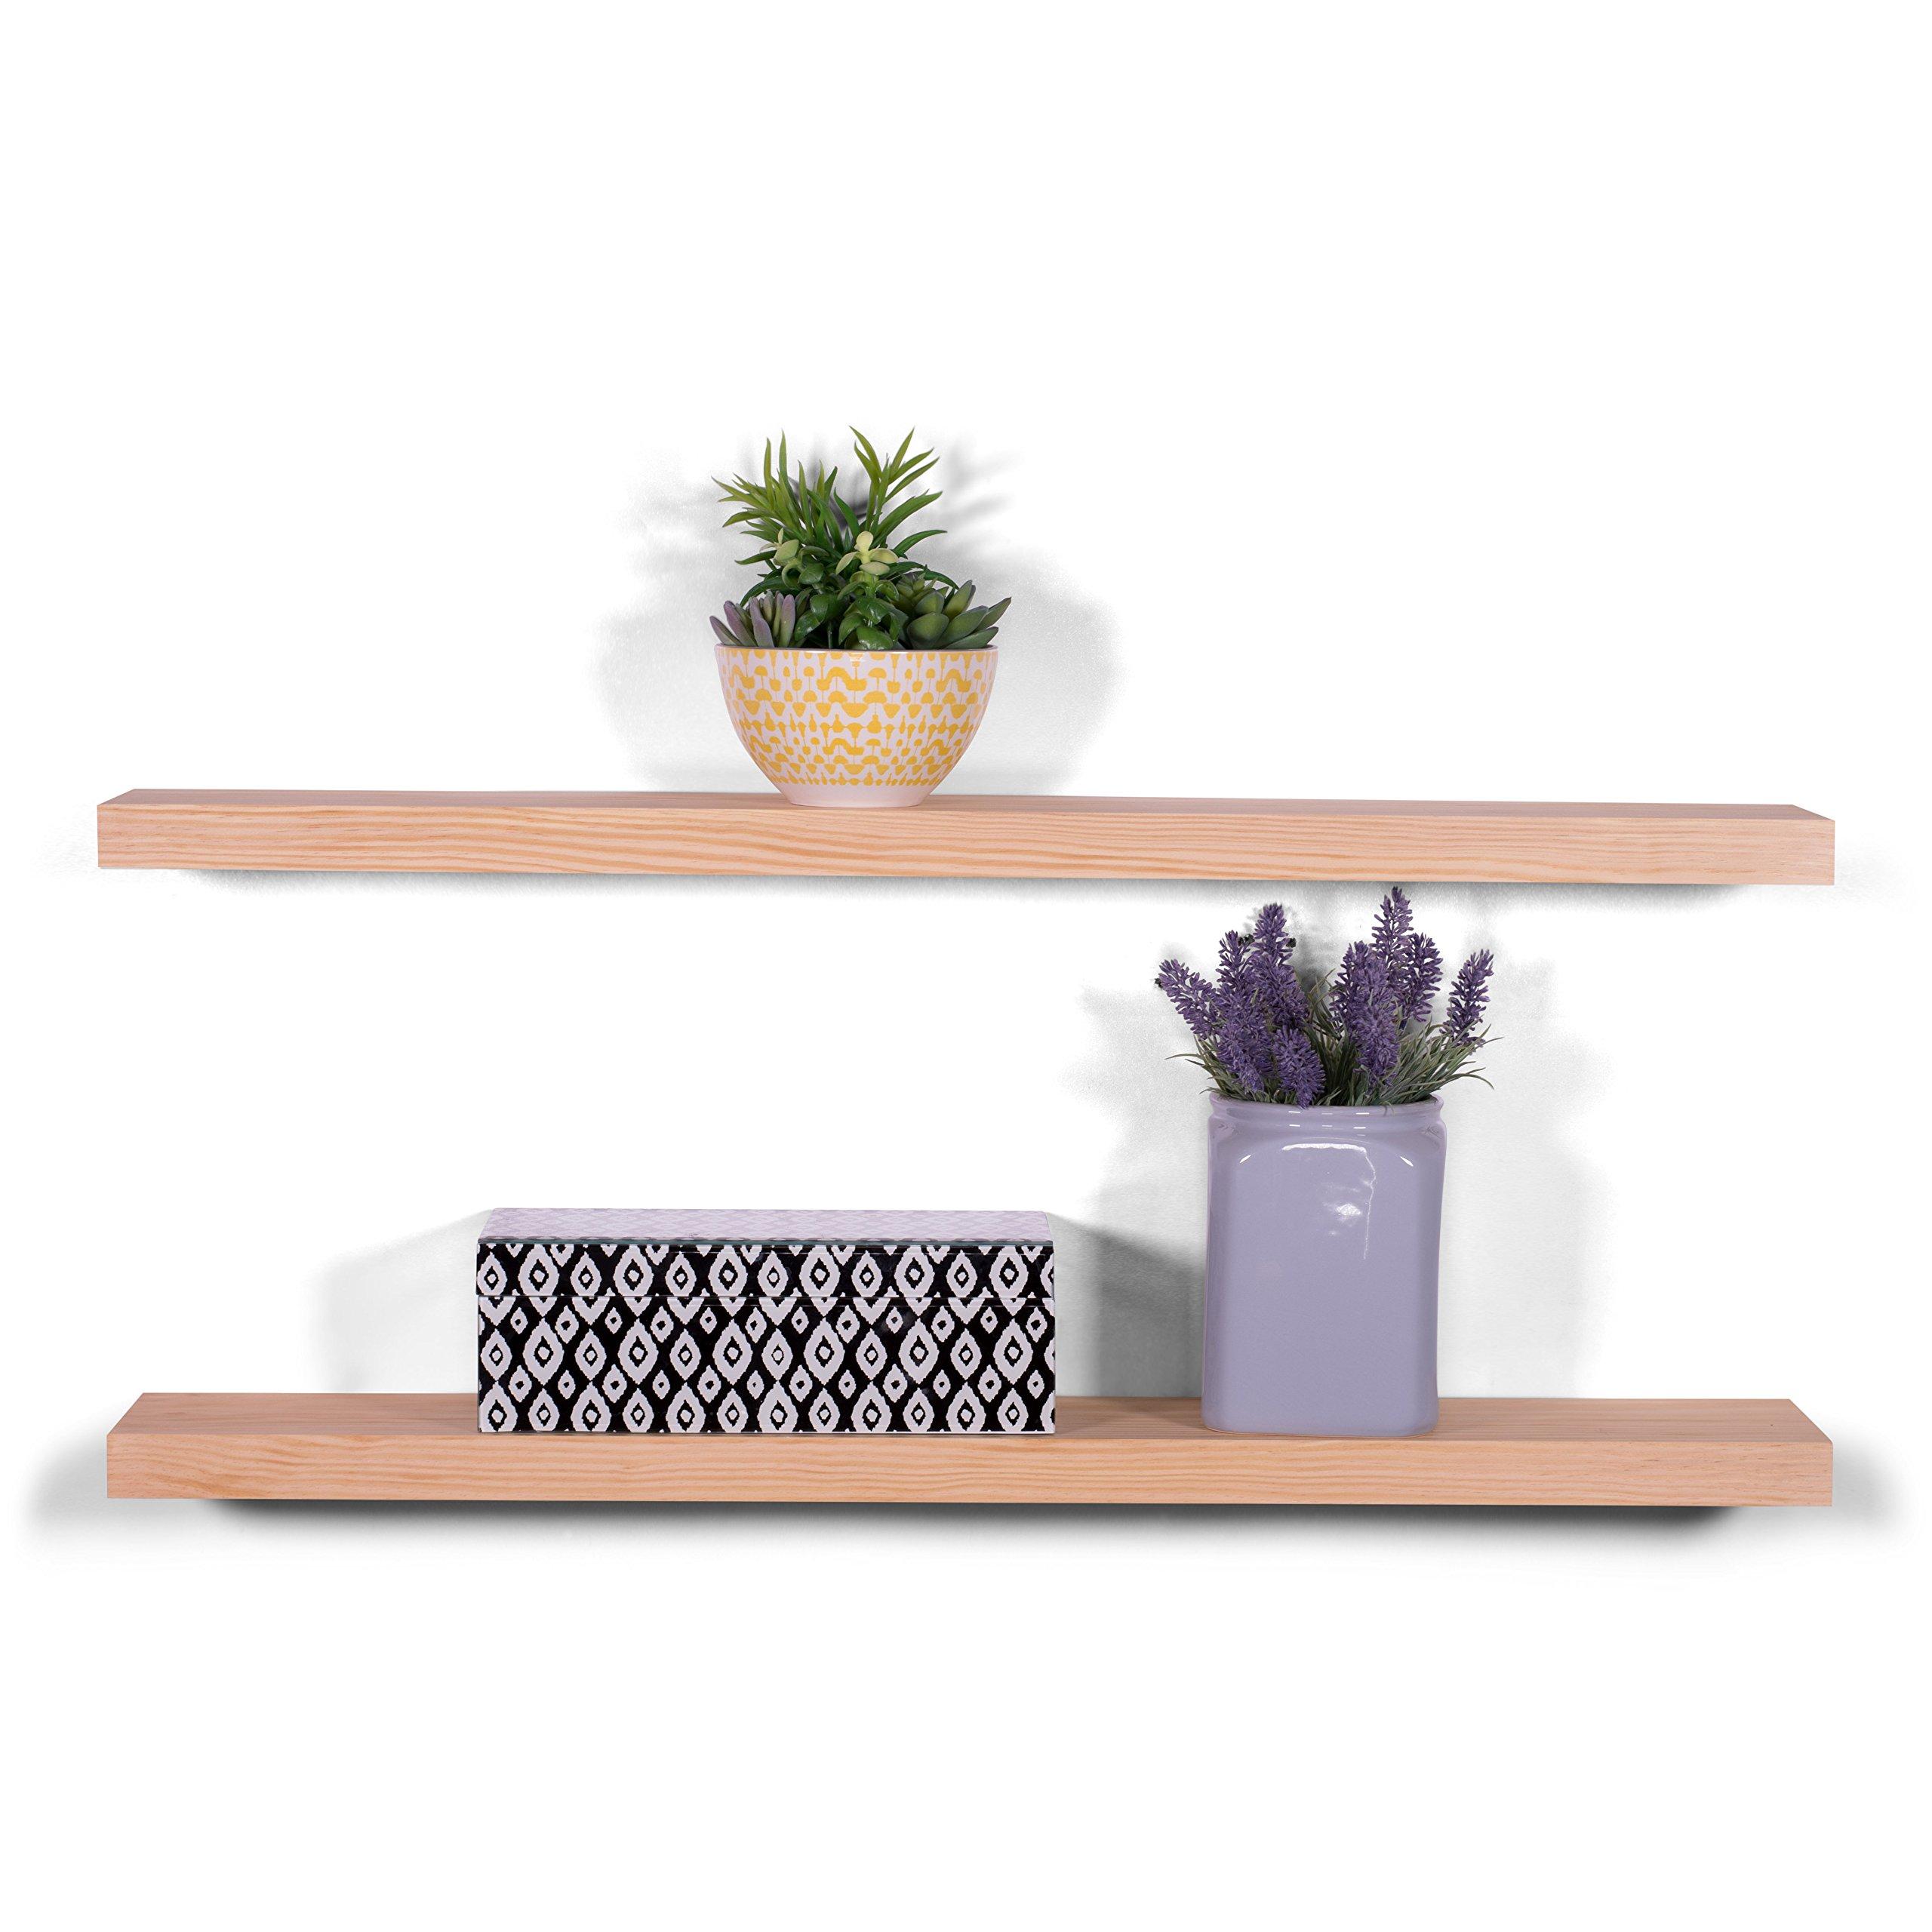 DAKODA LOVE 5.25'' Deep Clean Edge Floating Shelves, USA Handmade, Clear Coat Finish, 100% Countersunk Hidden Floating Shelf Brackets, Beautiful Grain Pine Wood Wall Decor (Set of 2) (36'', Natural)